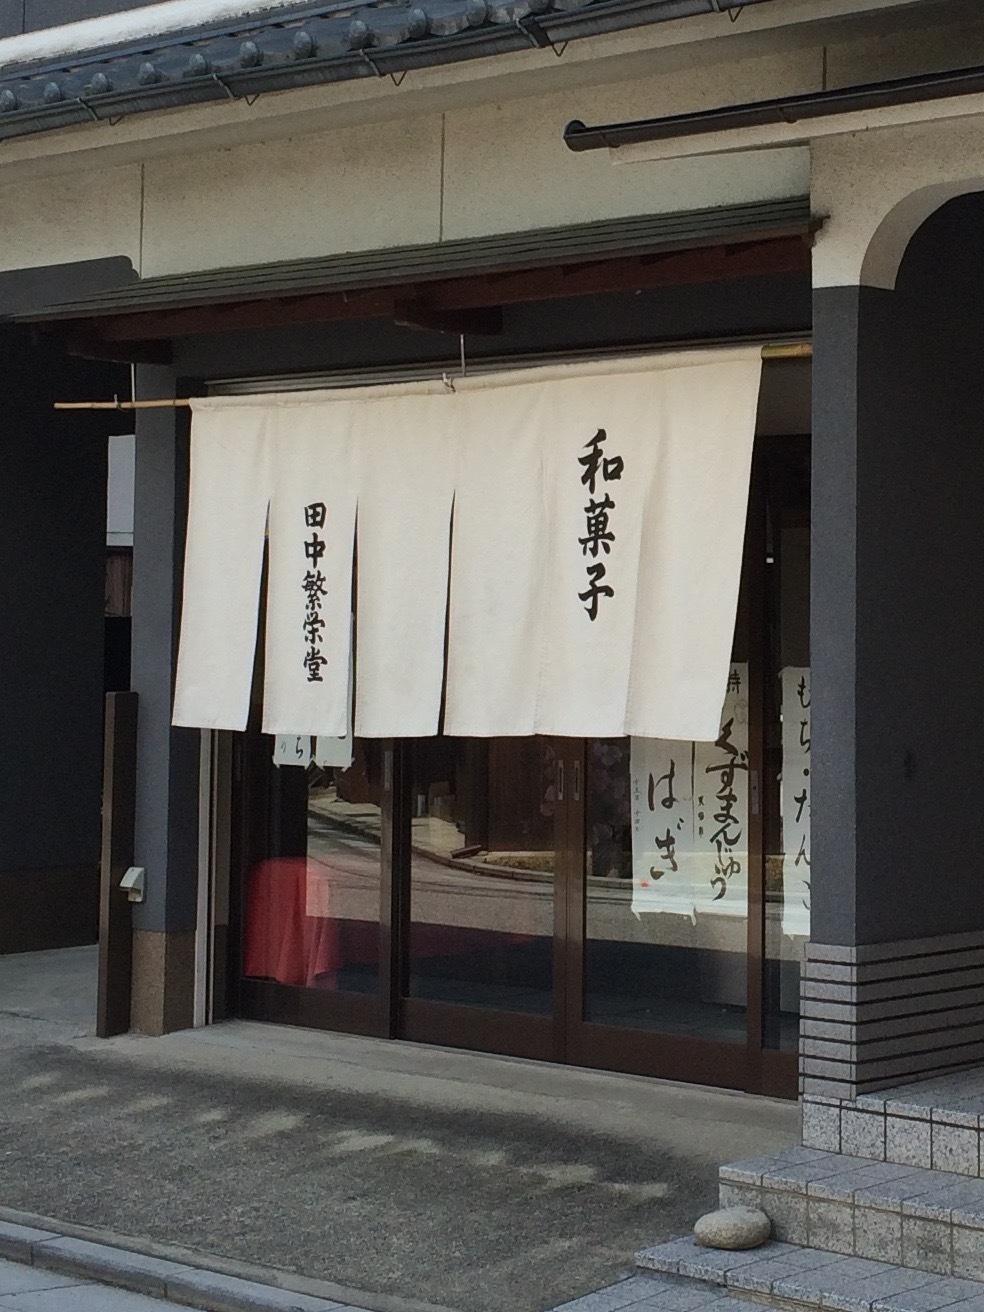 田中繁栄堂 name=